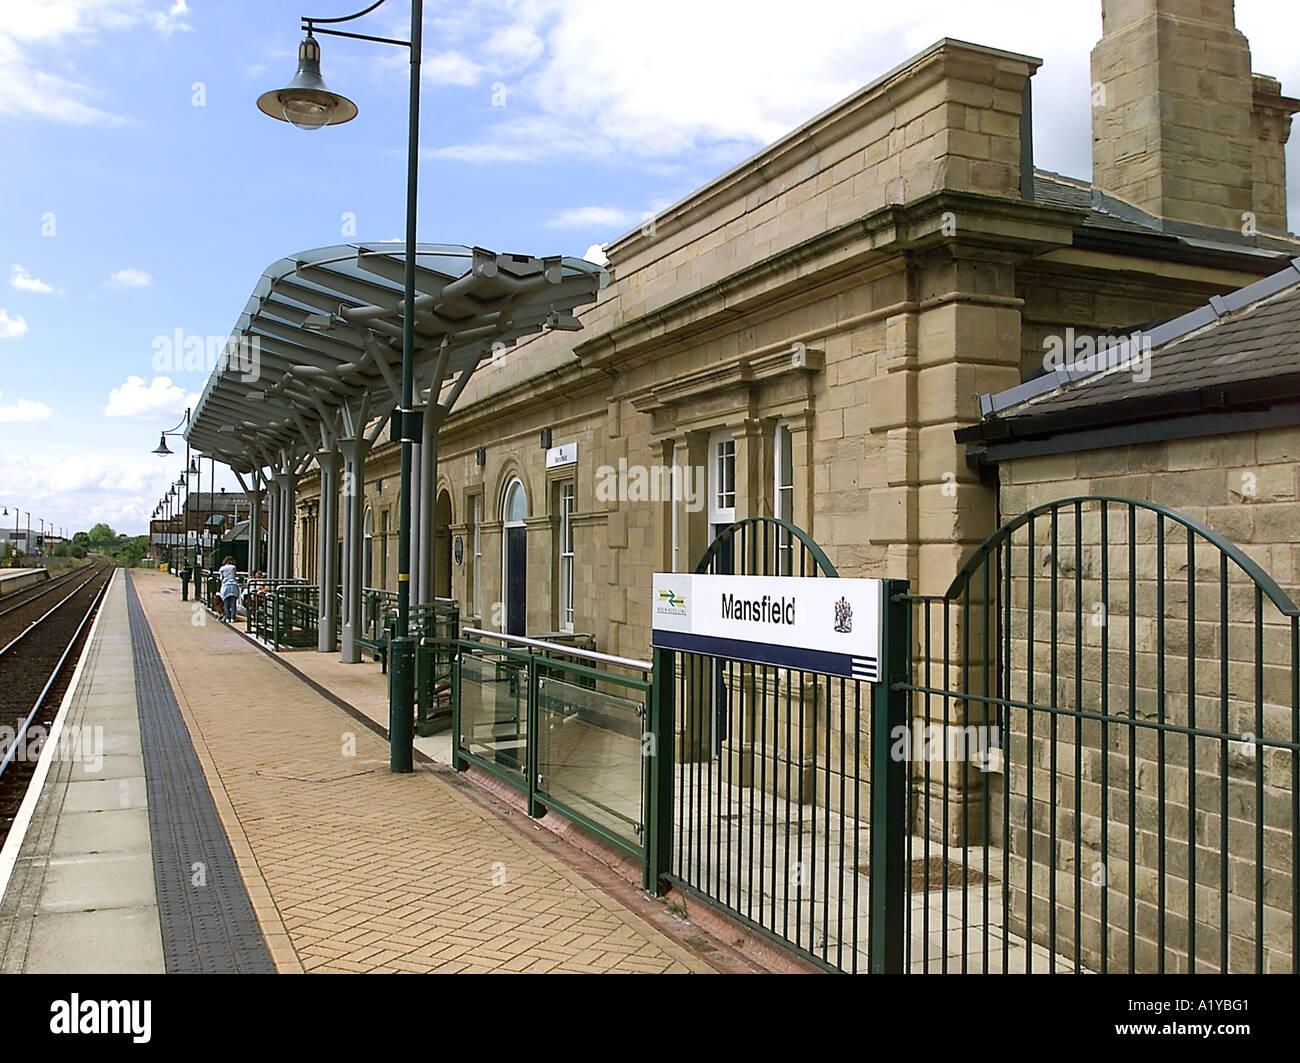 Mansfield station, Robin Hood Line, Nottinghamshire - Stock Image